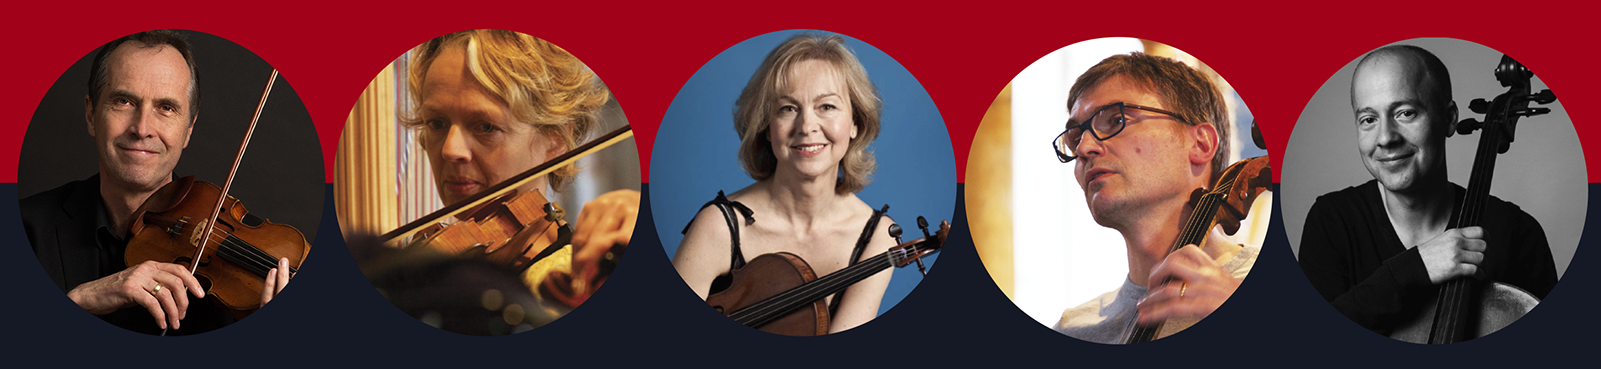 UntunedSky Concert 5 December Schubert and Boccherini